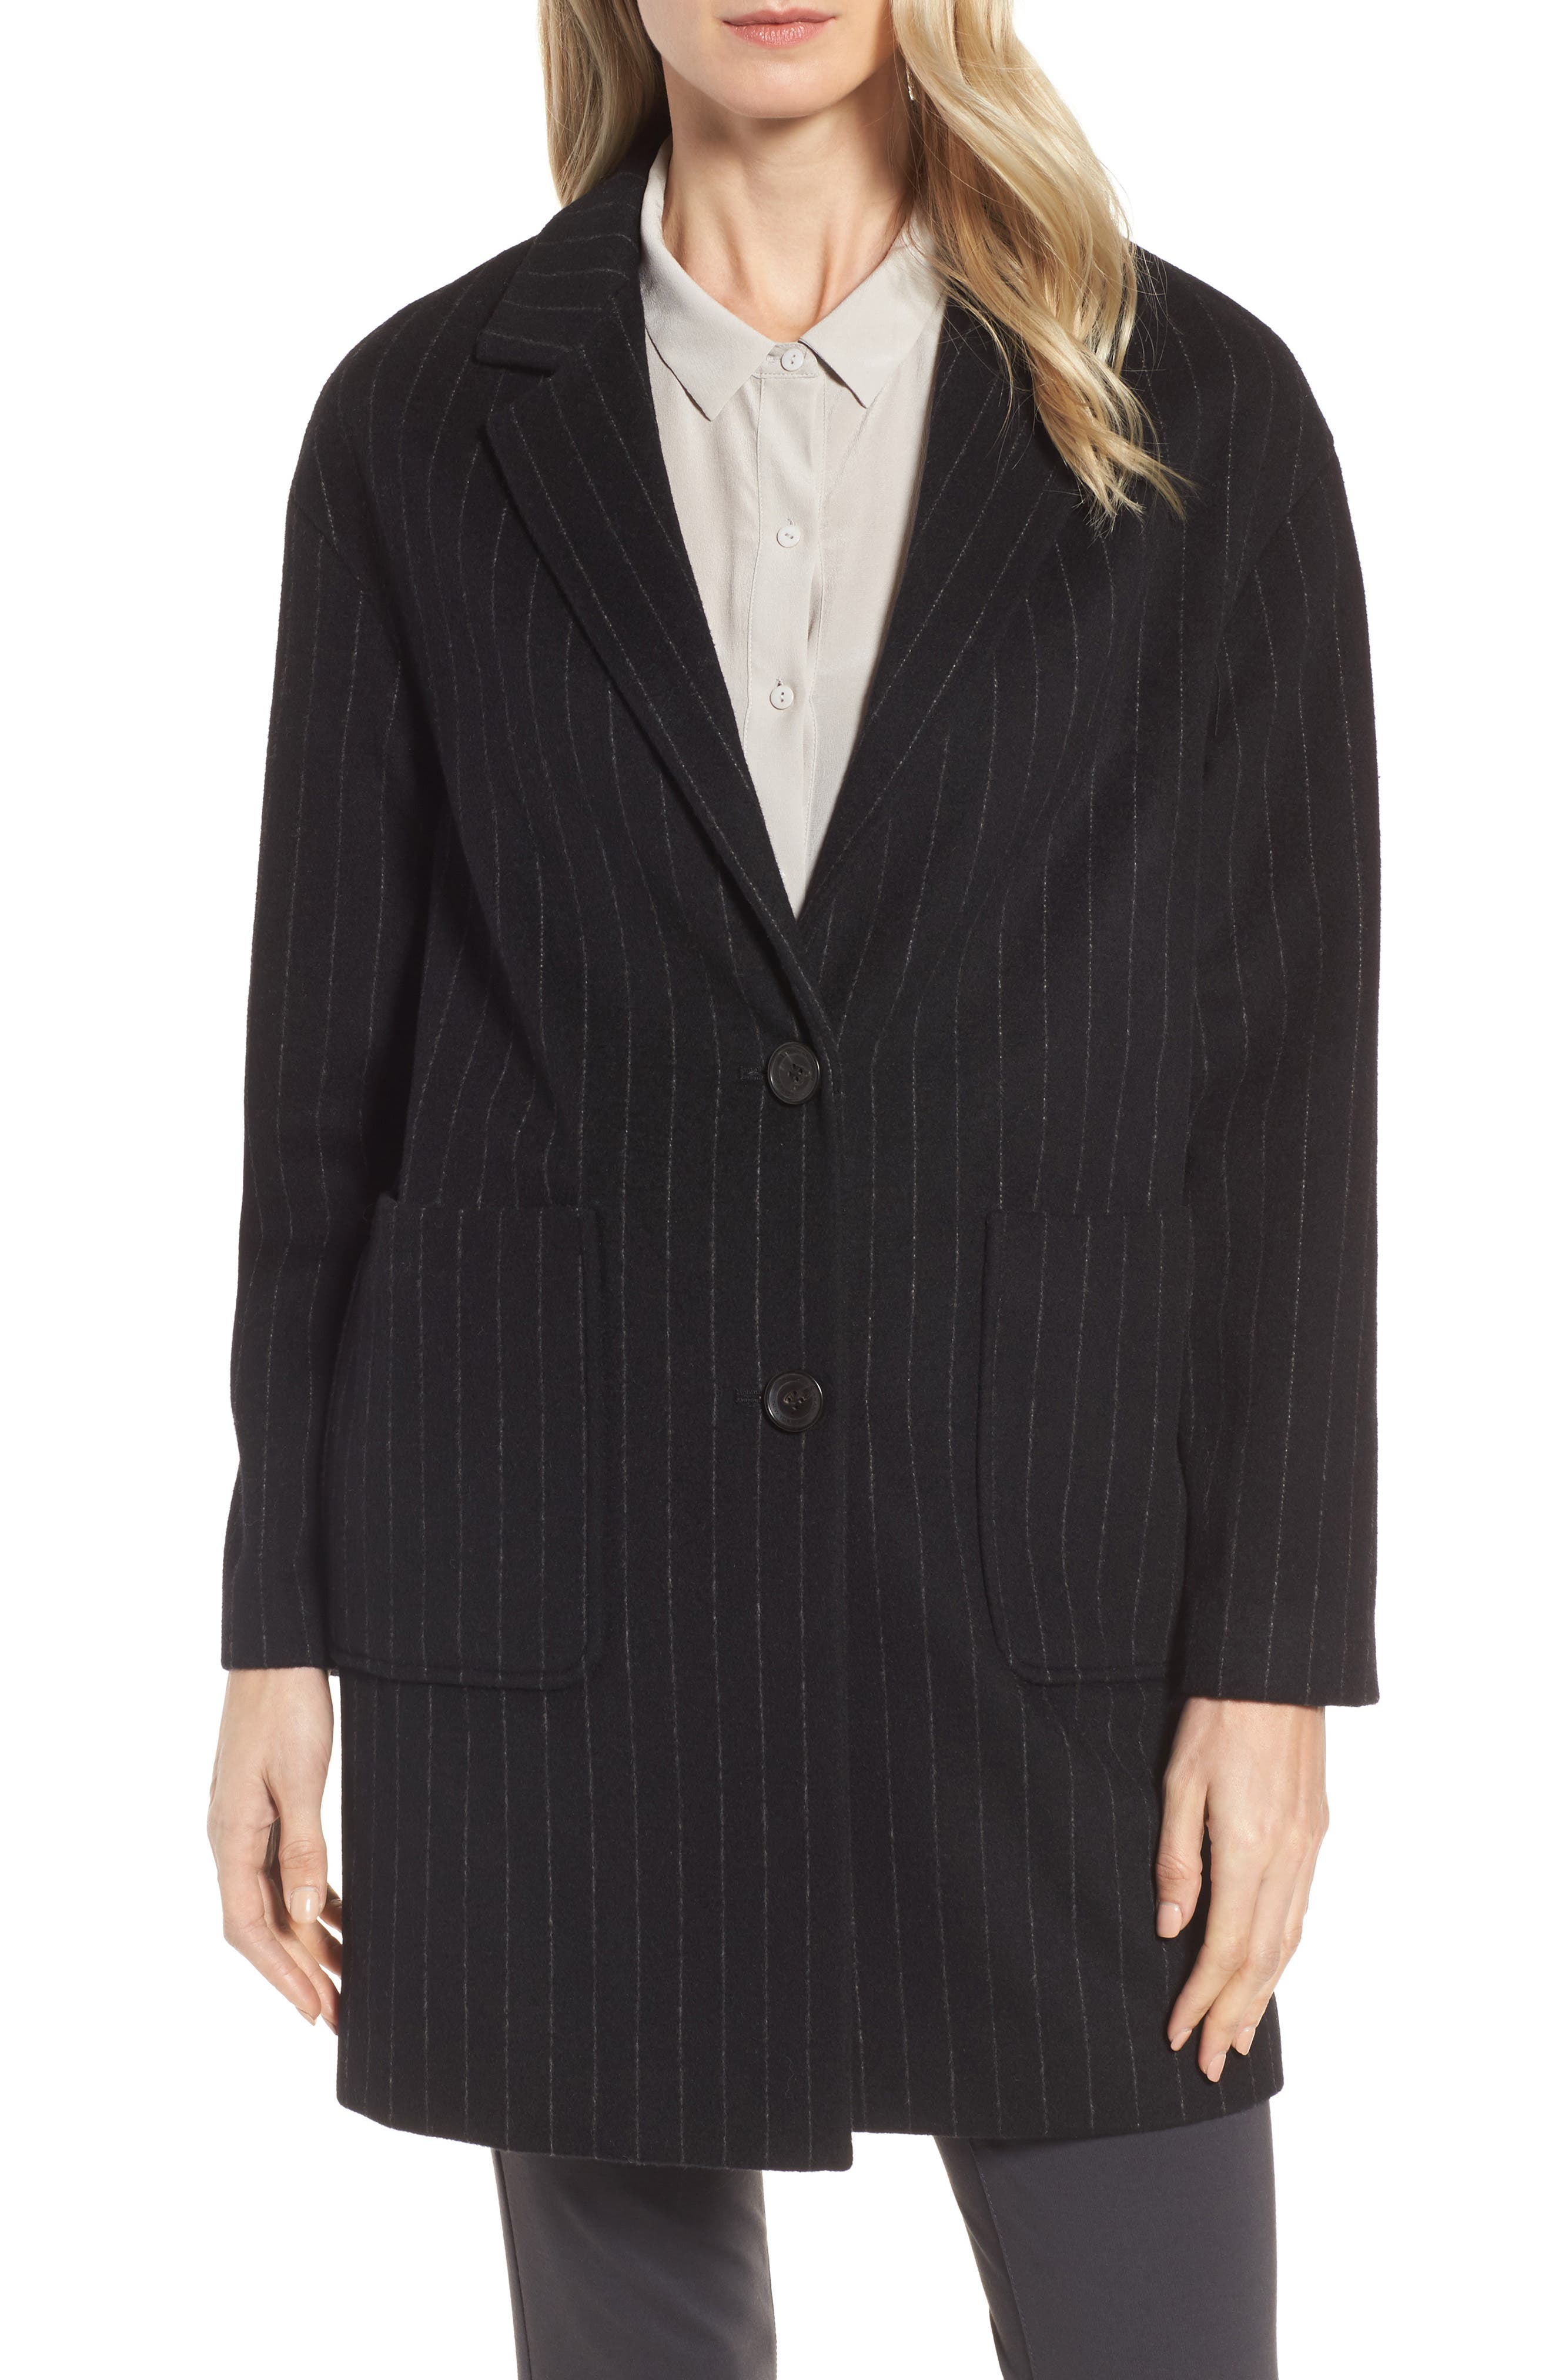 DKNY Pinstripe Wool Blend Coat